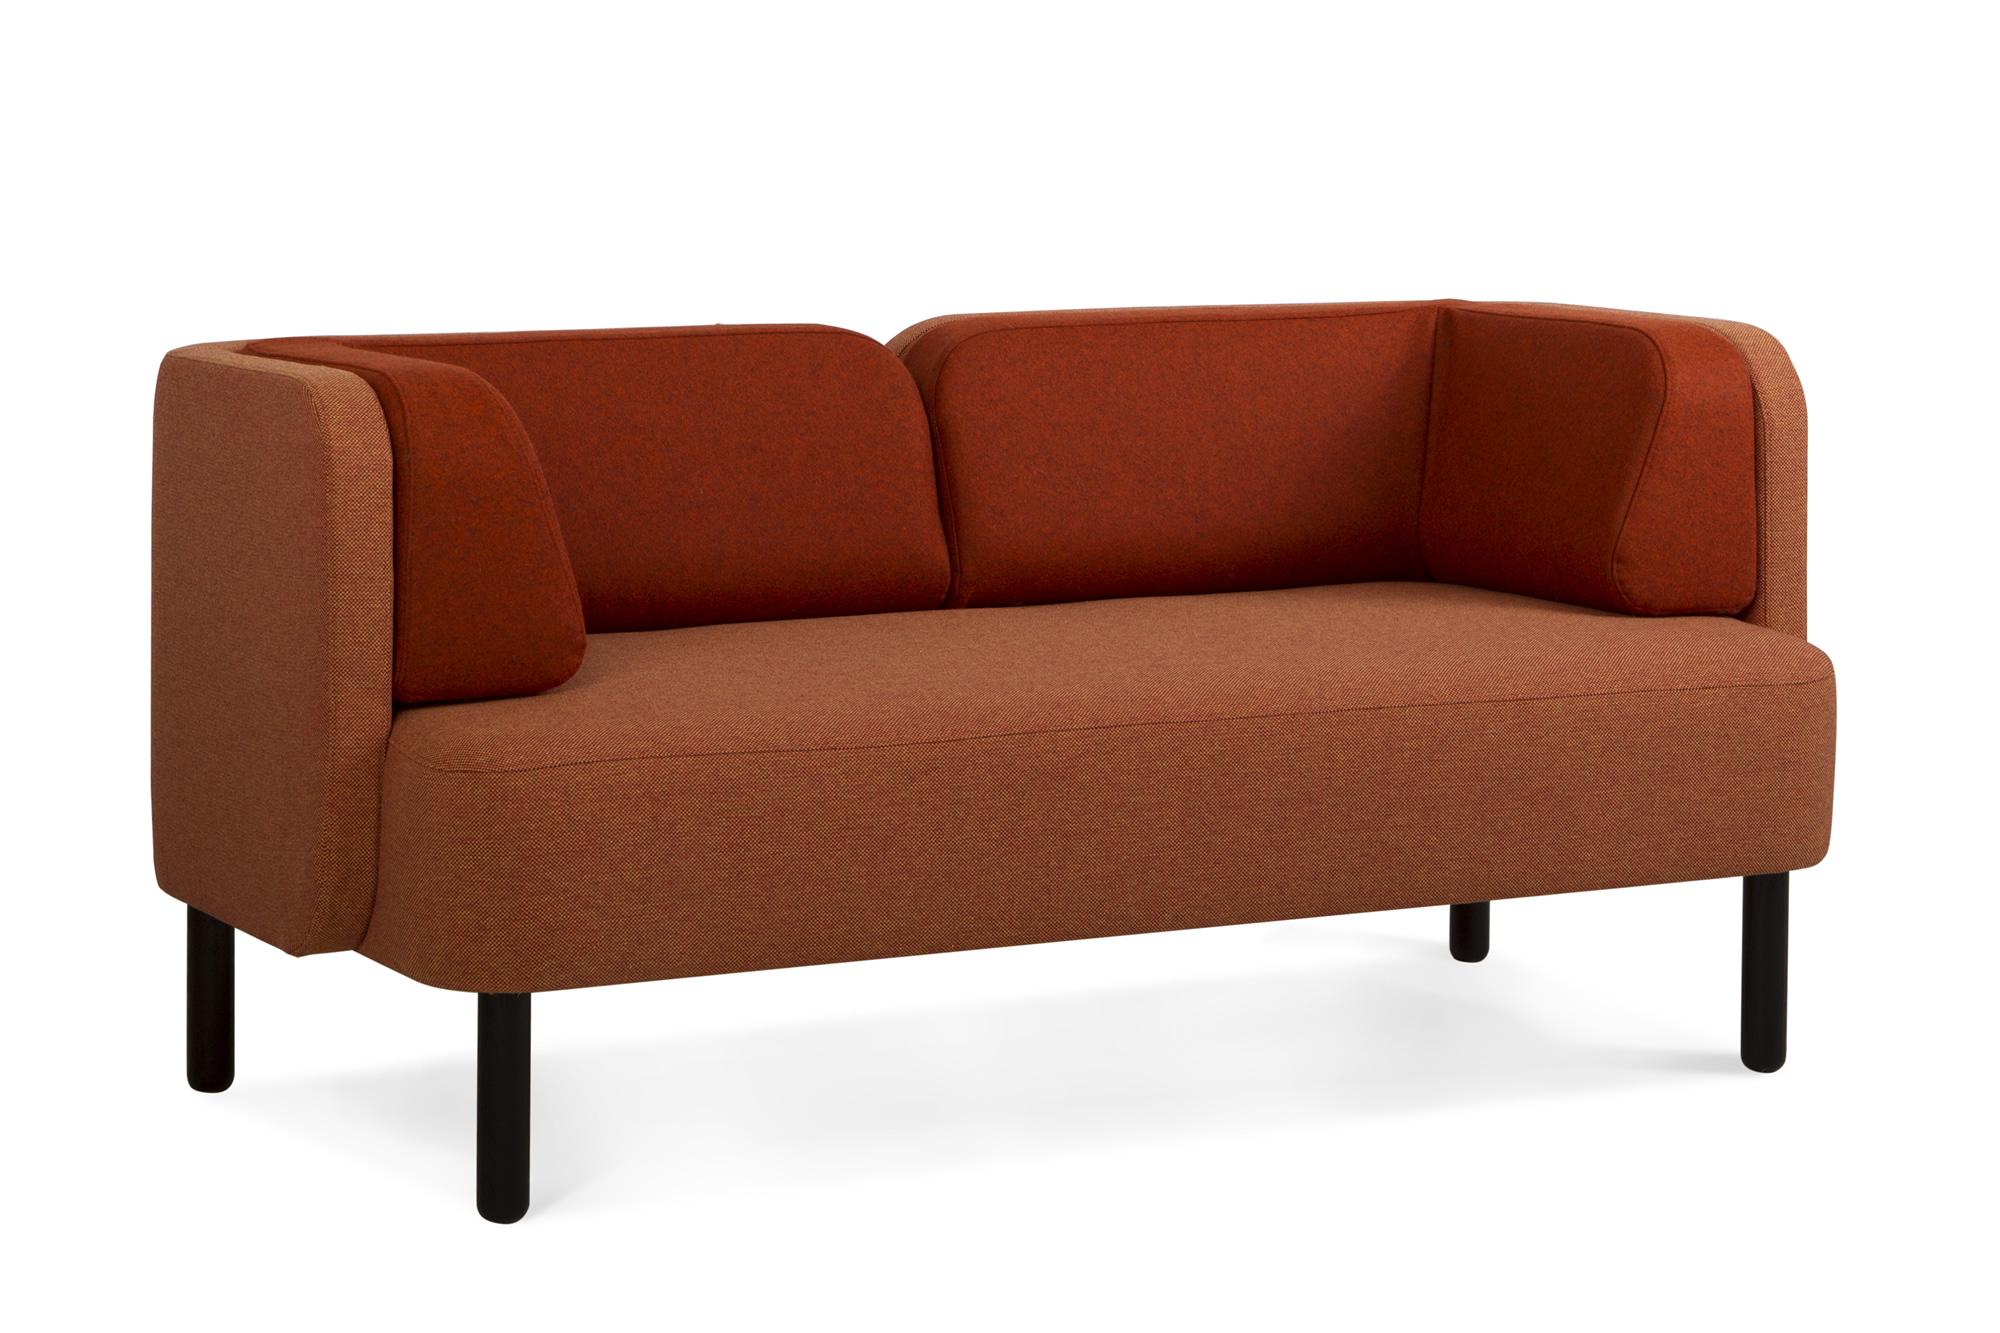 Story Sofa by Helene Tiedemann for Jonas Ihreborn